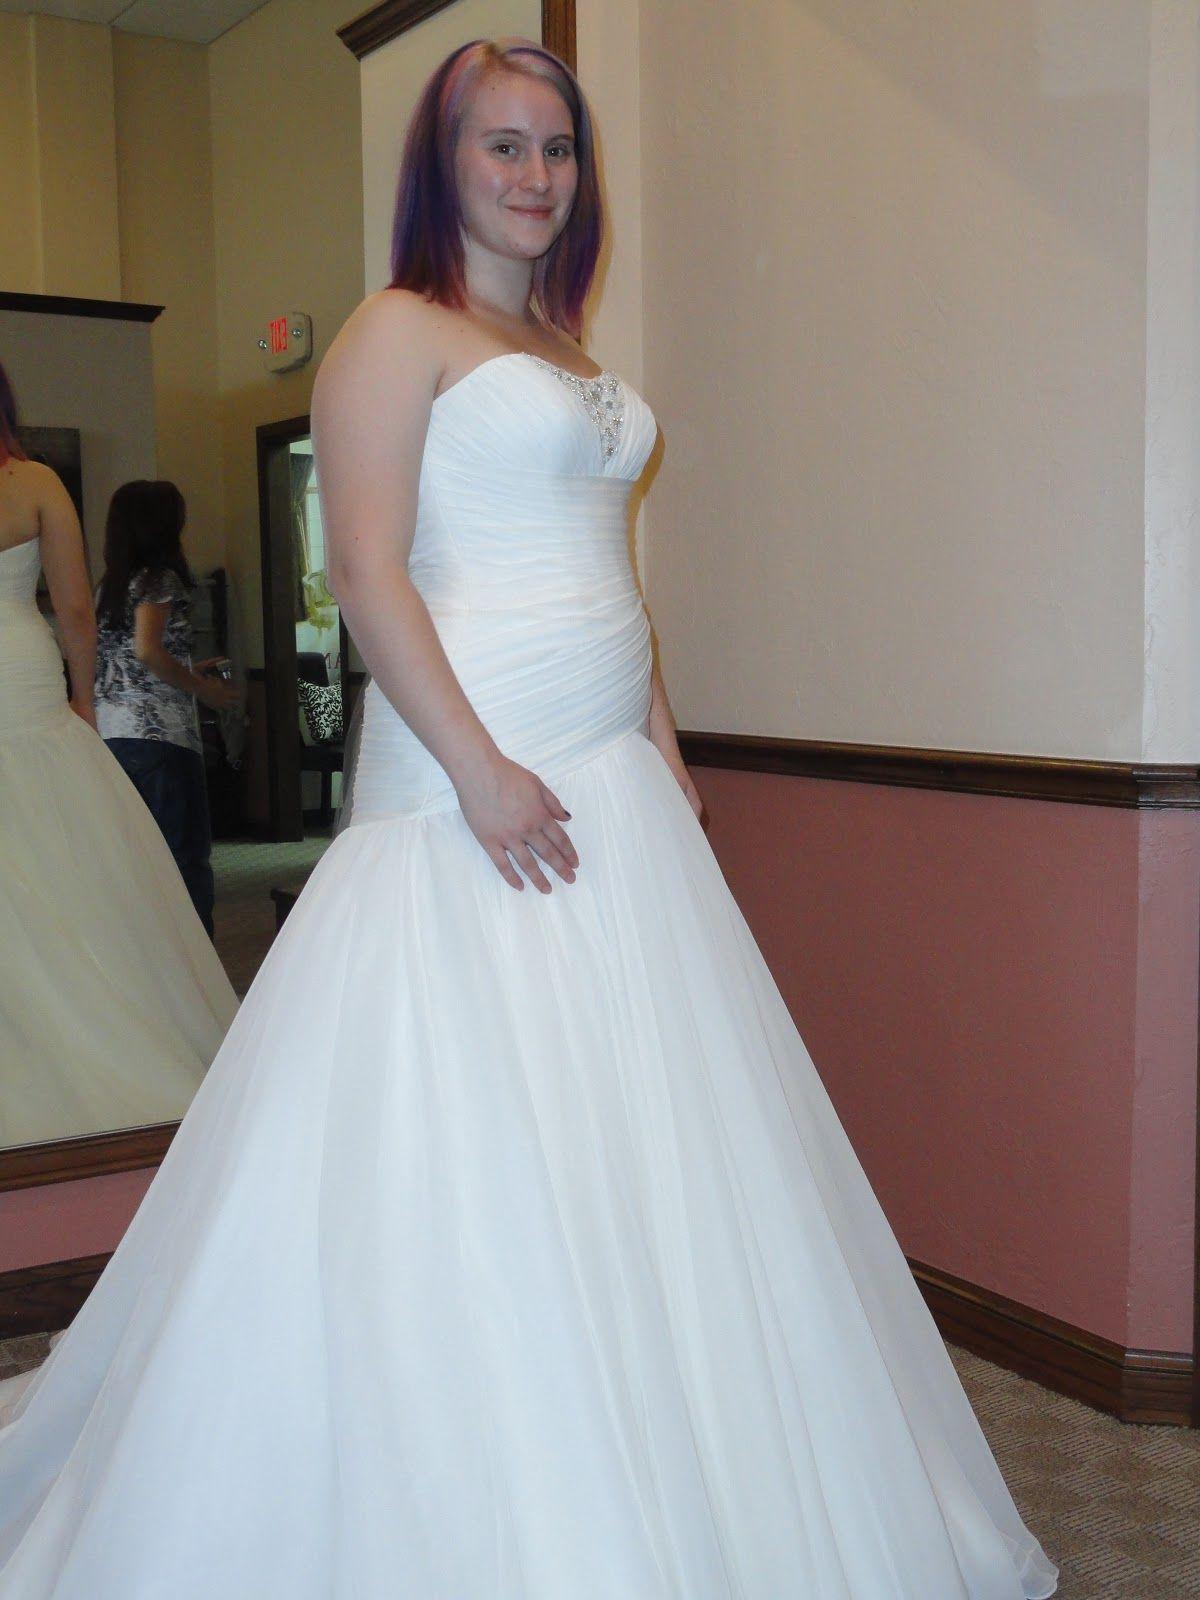 Dresses For September Wedding Best Dress Pear Shaped Check More At Http